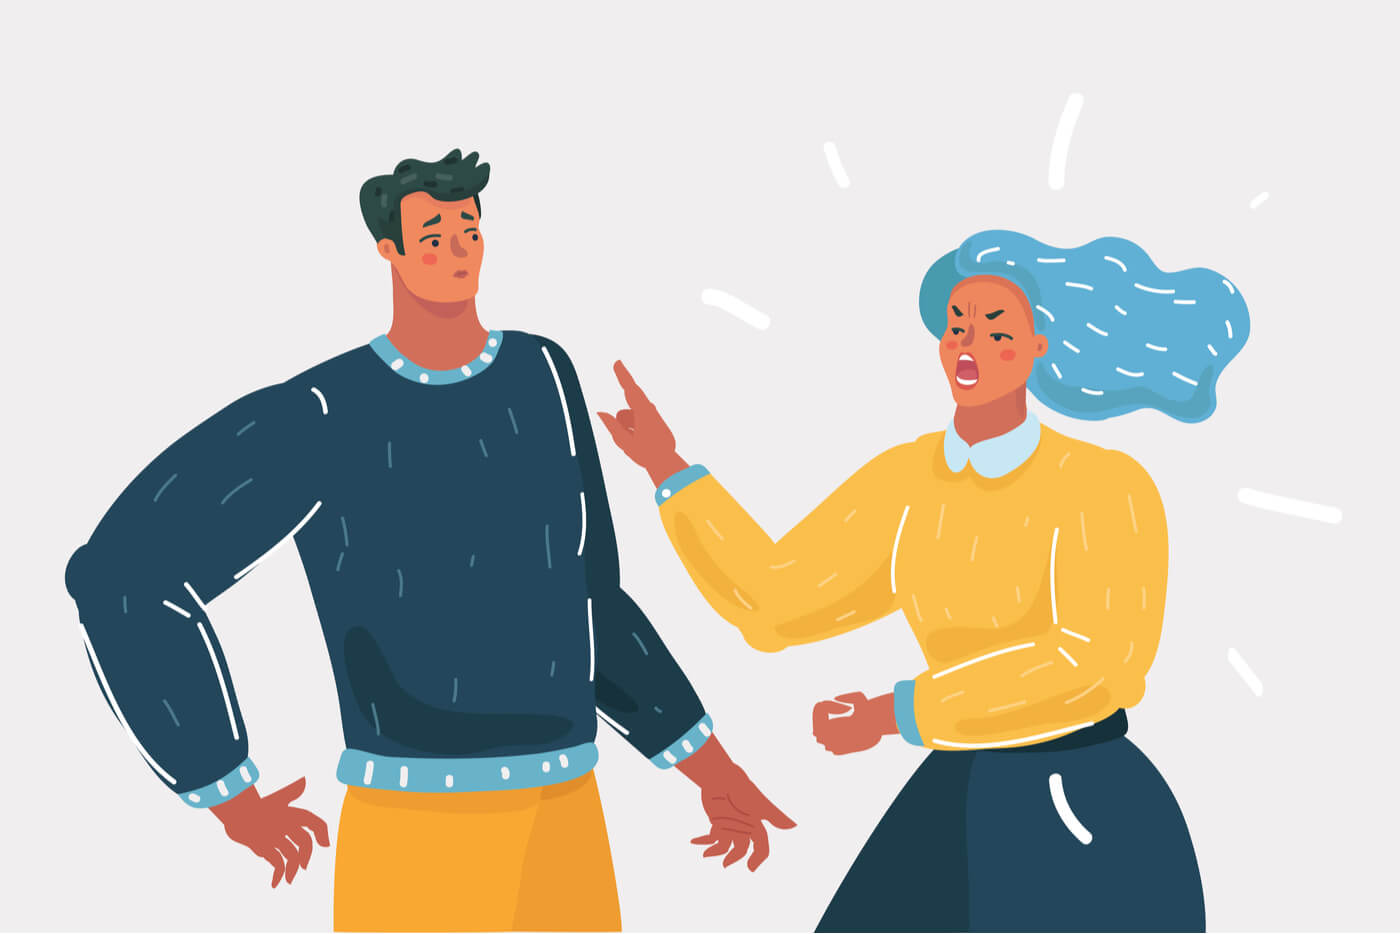 pareja-discutiendo-ilustracion